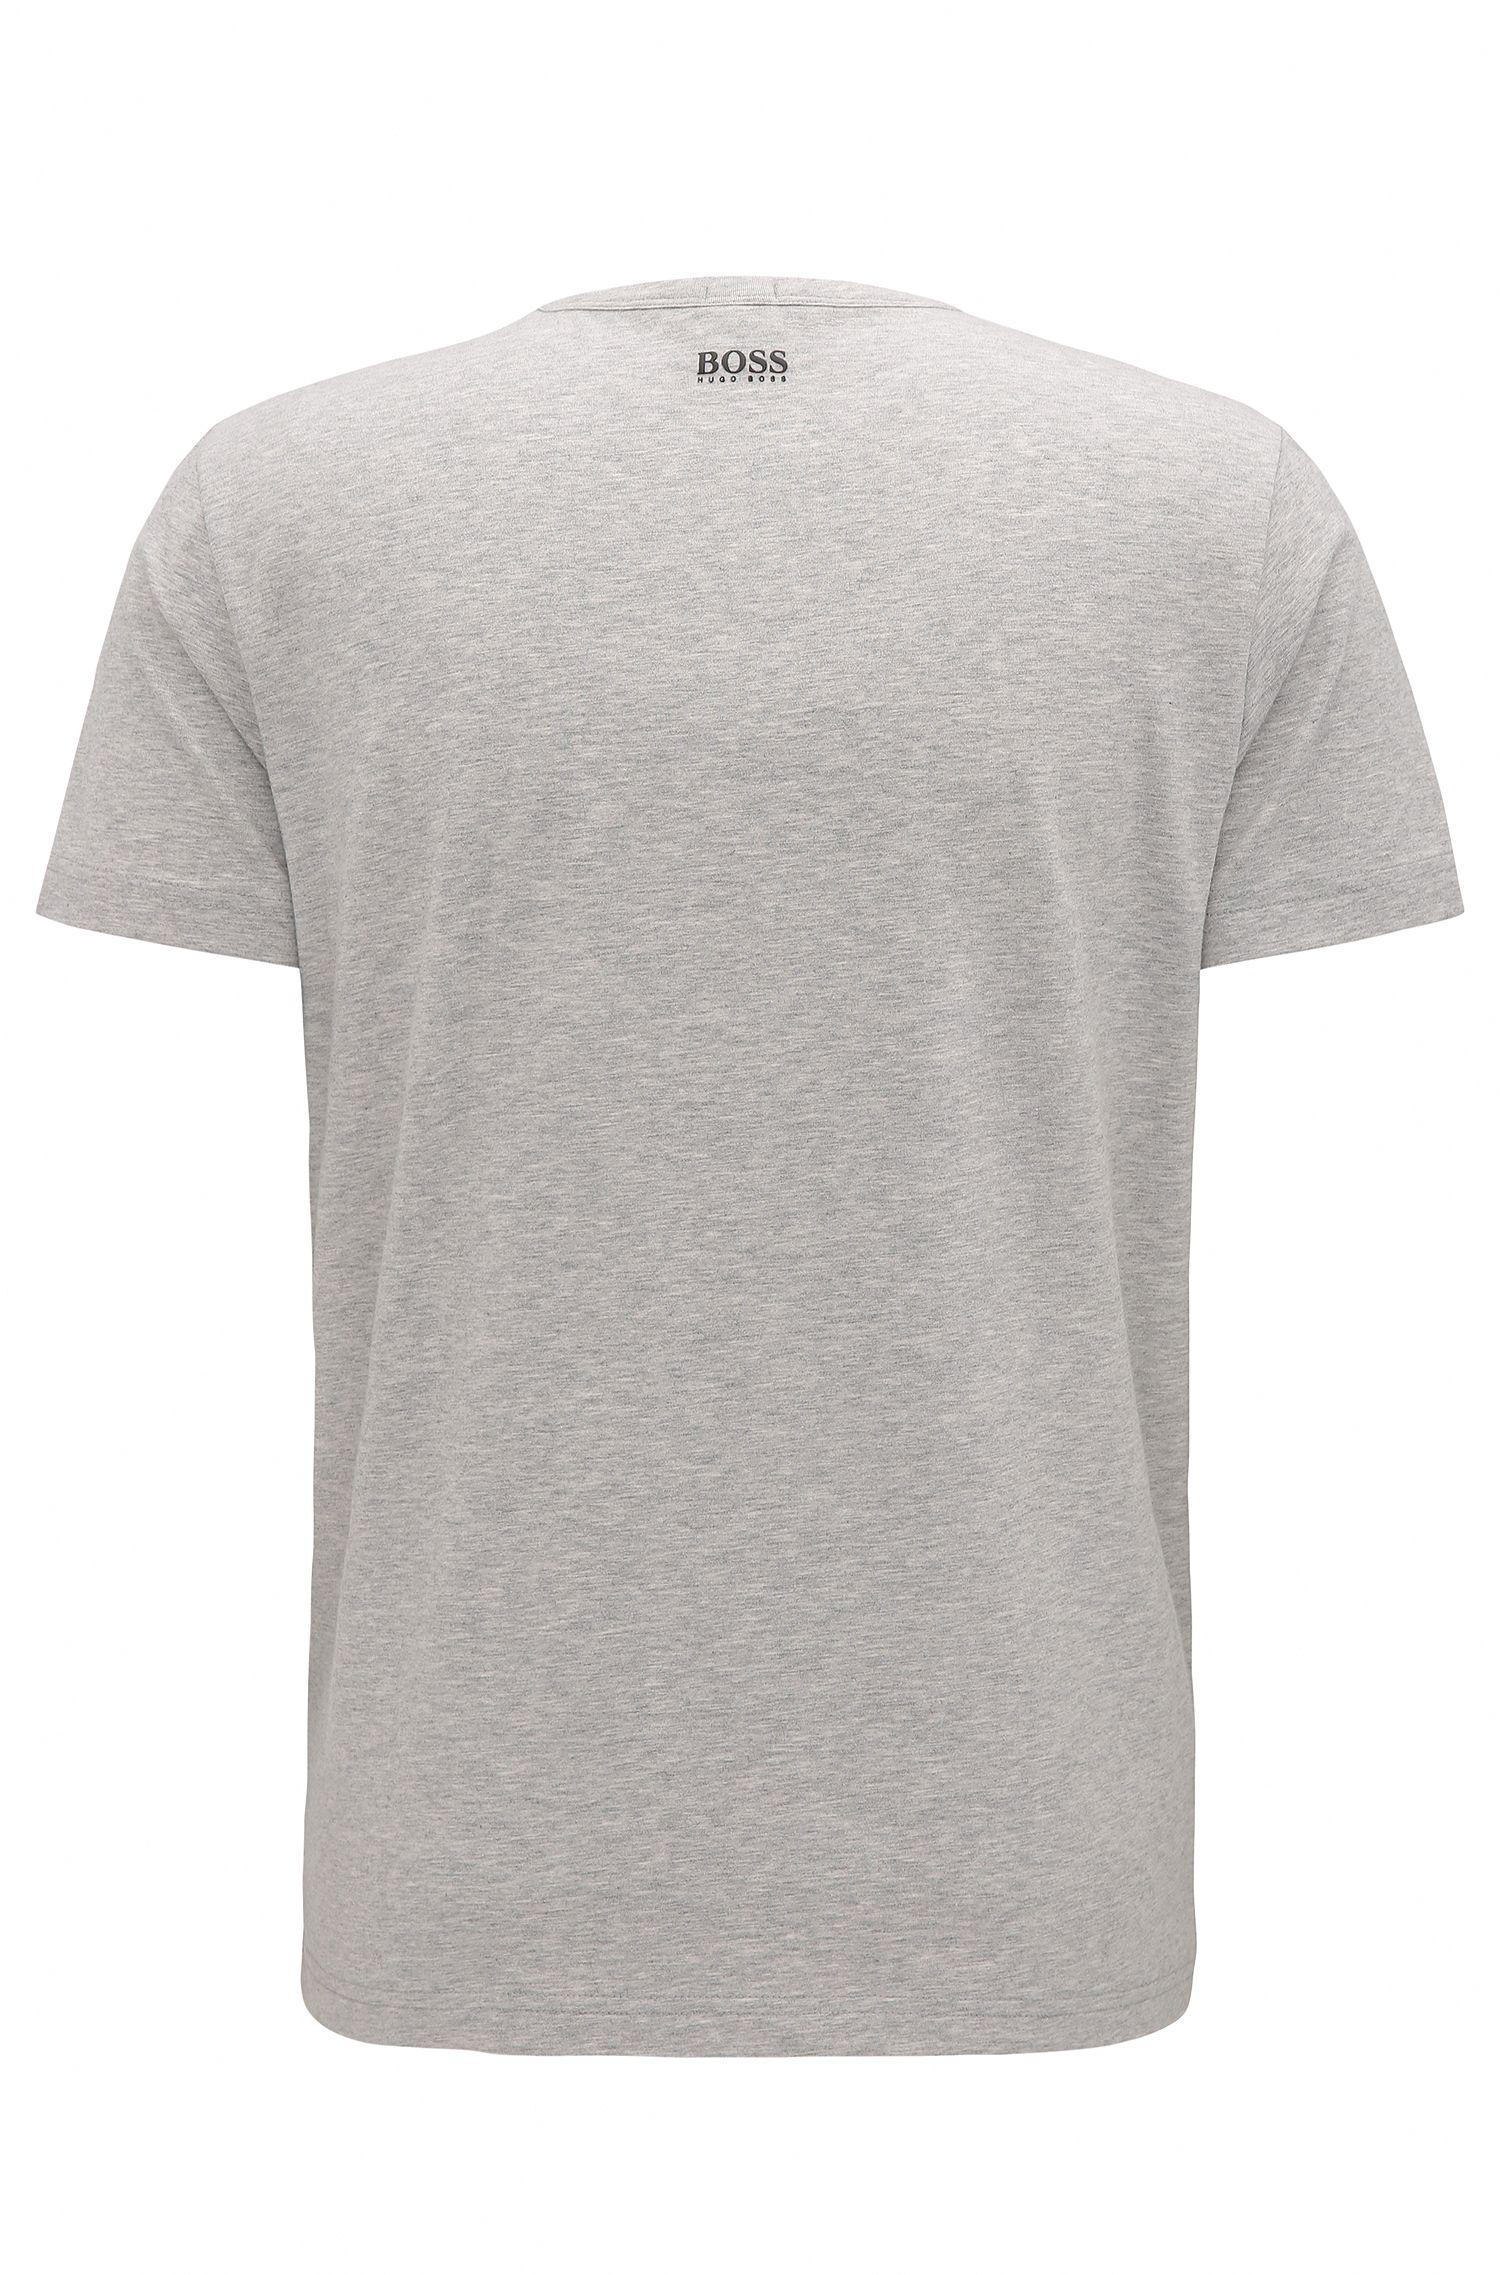 Stretch Cotton Jersey Graphic T-Shirt | Tee, Light Grey